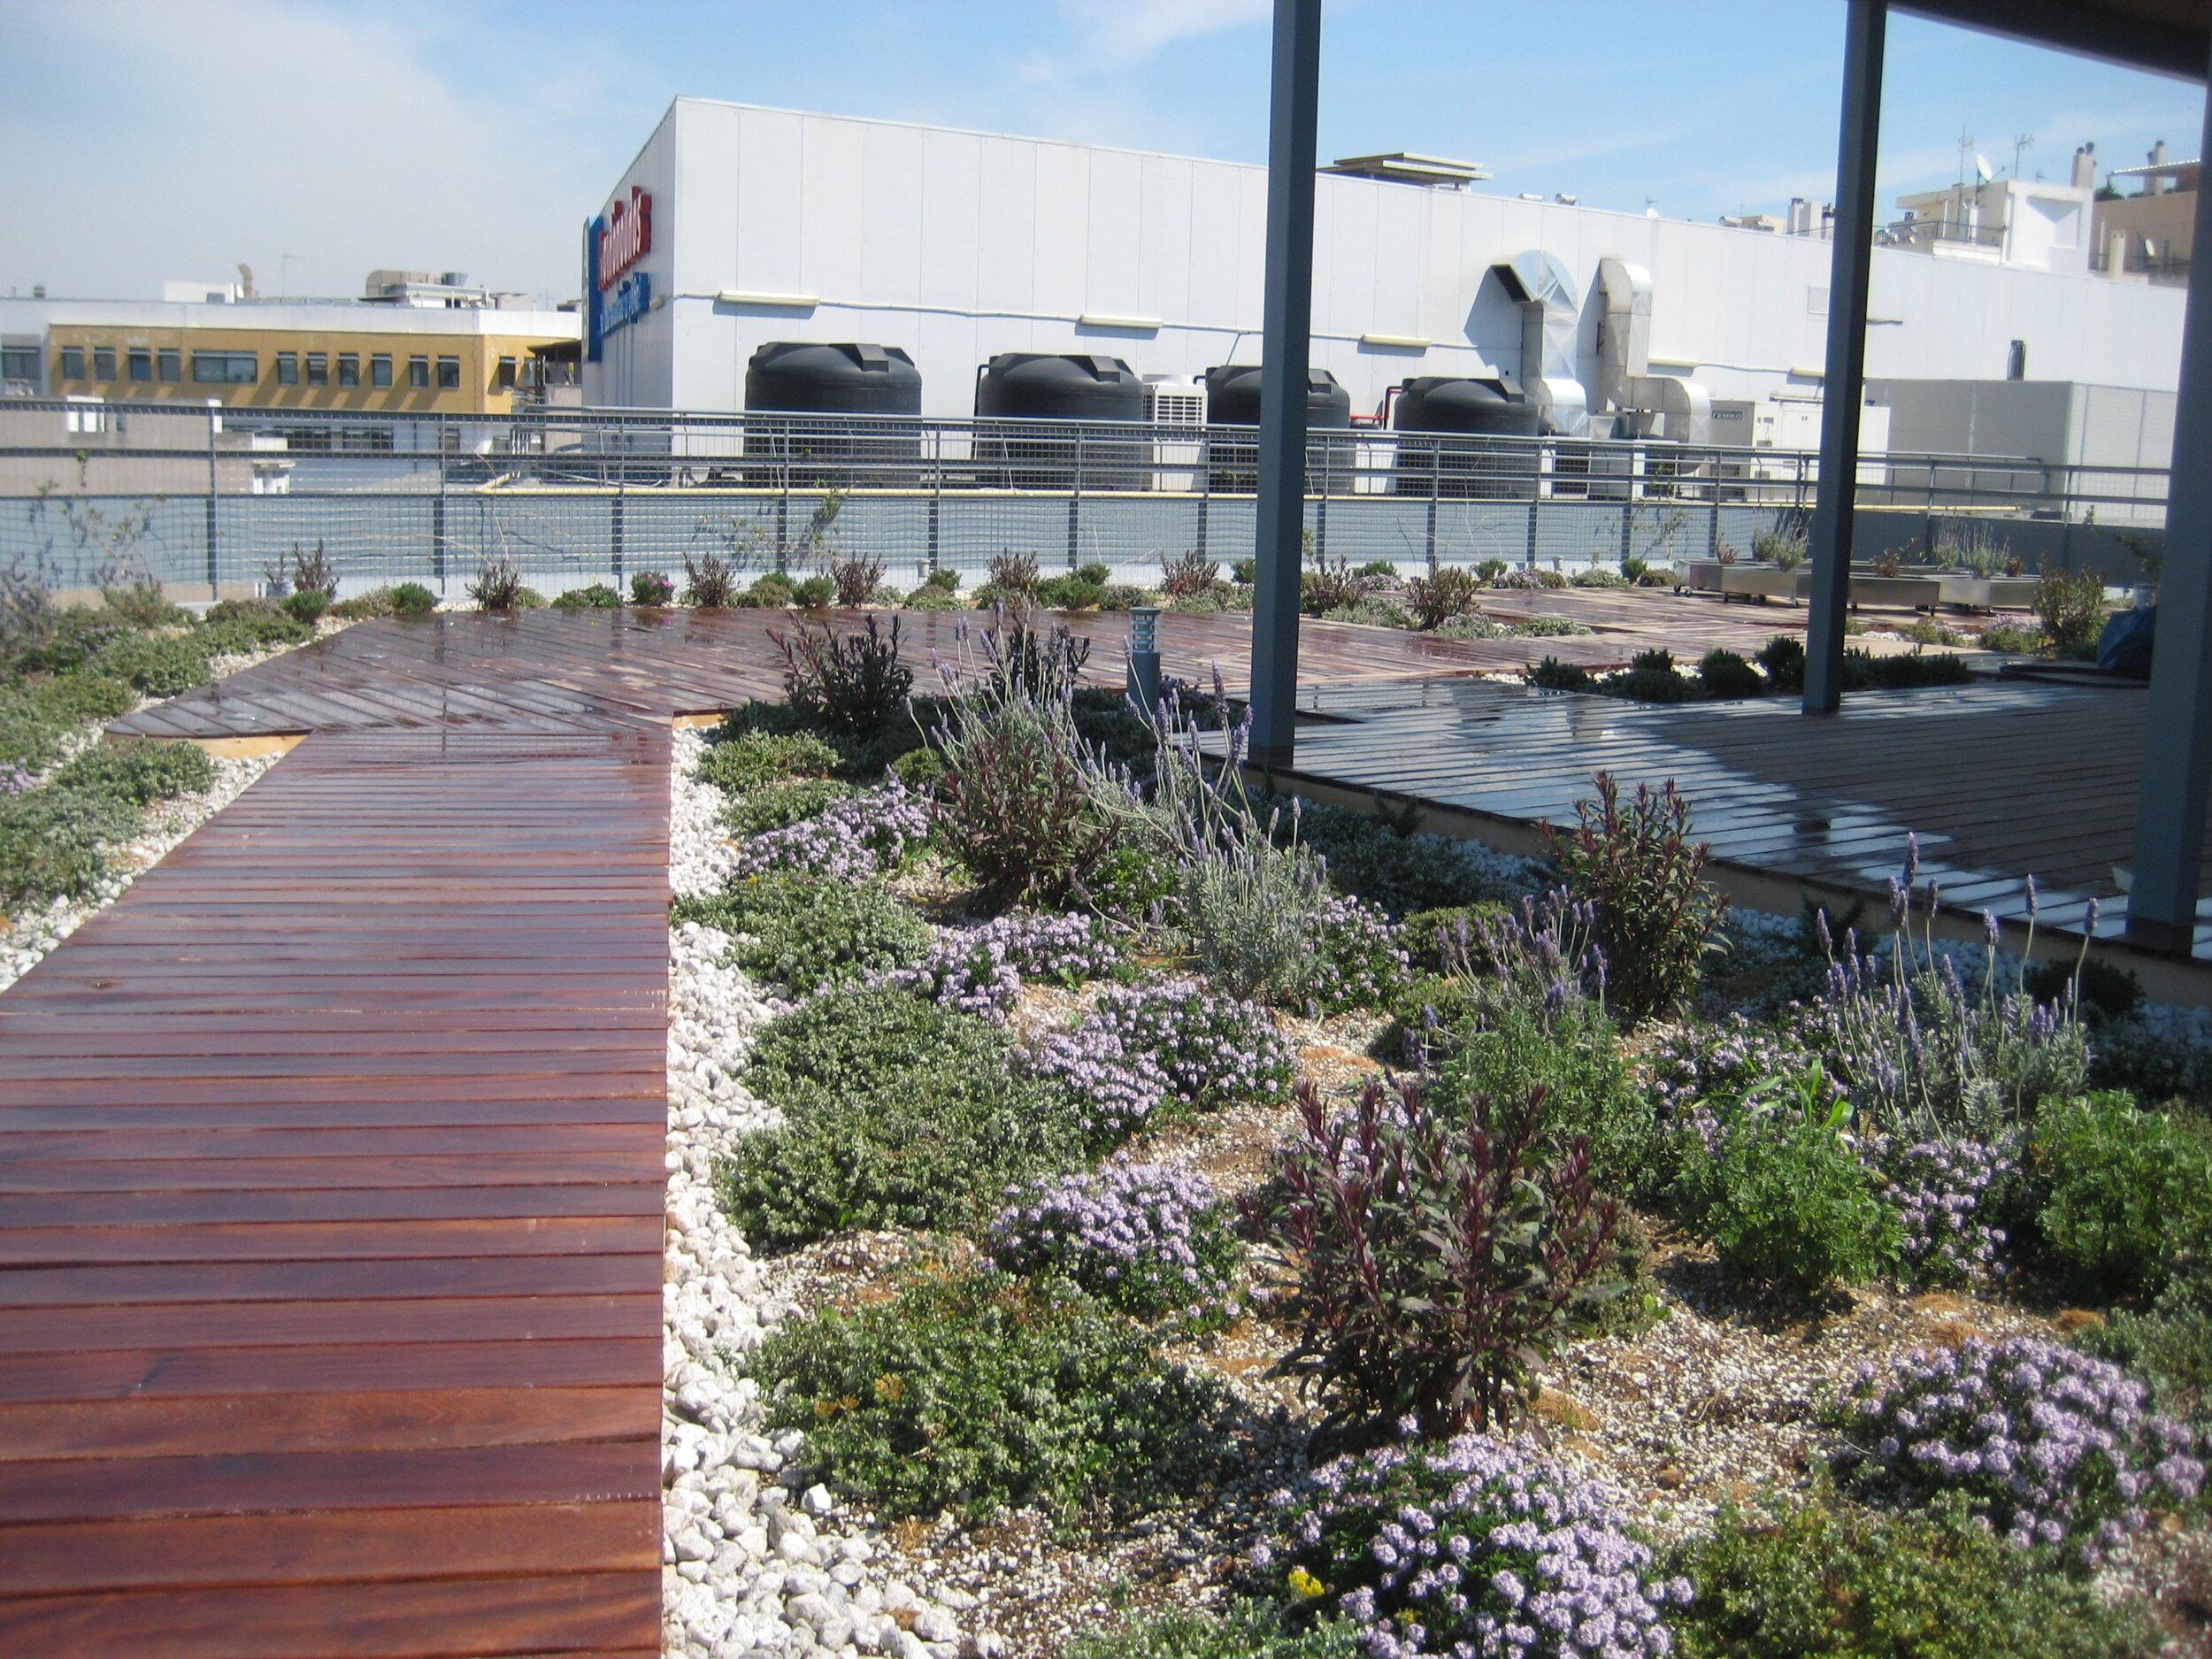 Vivacity green roof garden, decking and gravel